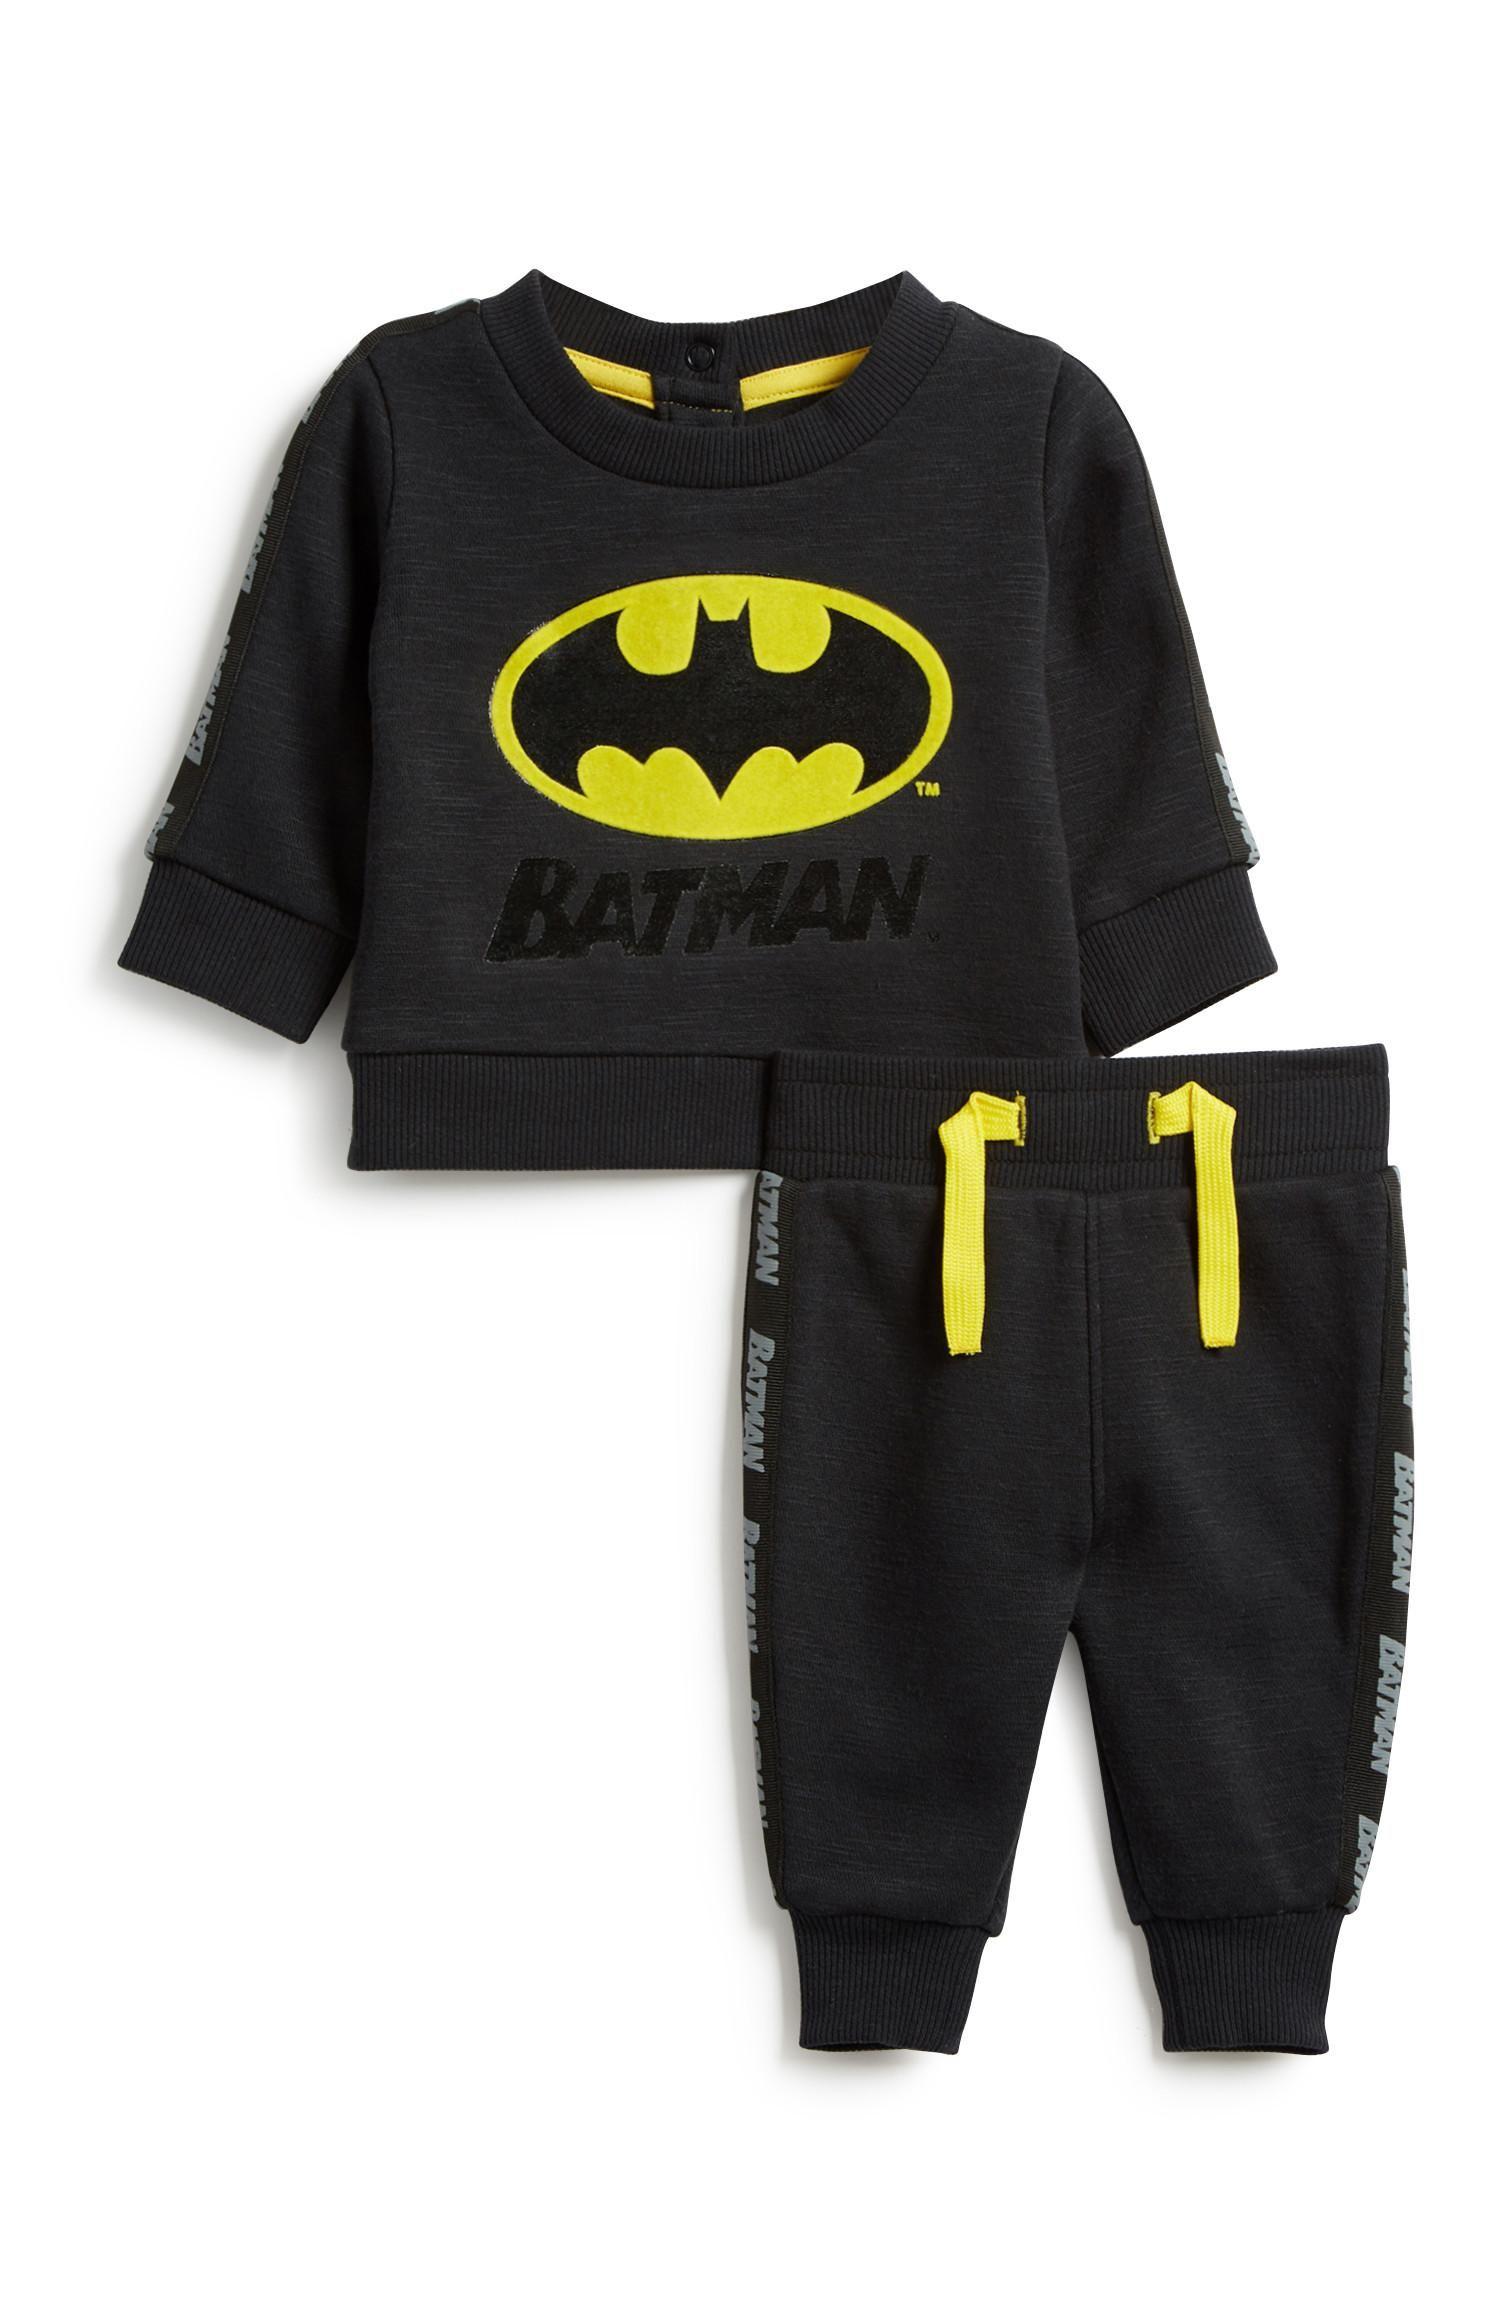 NEW Baby Boys Batman Bodysuit 3-6 Mo Creeper Outfit 1 Piece Superhero Winter